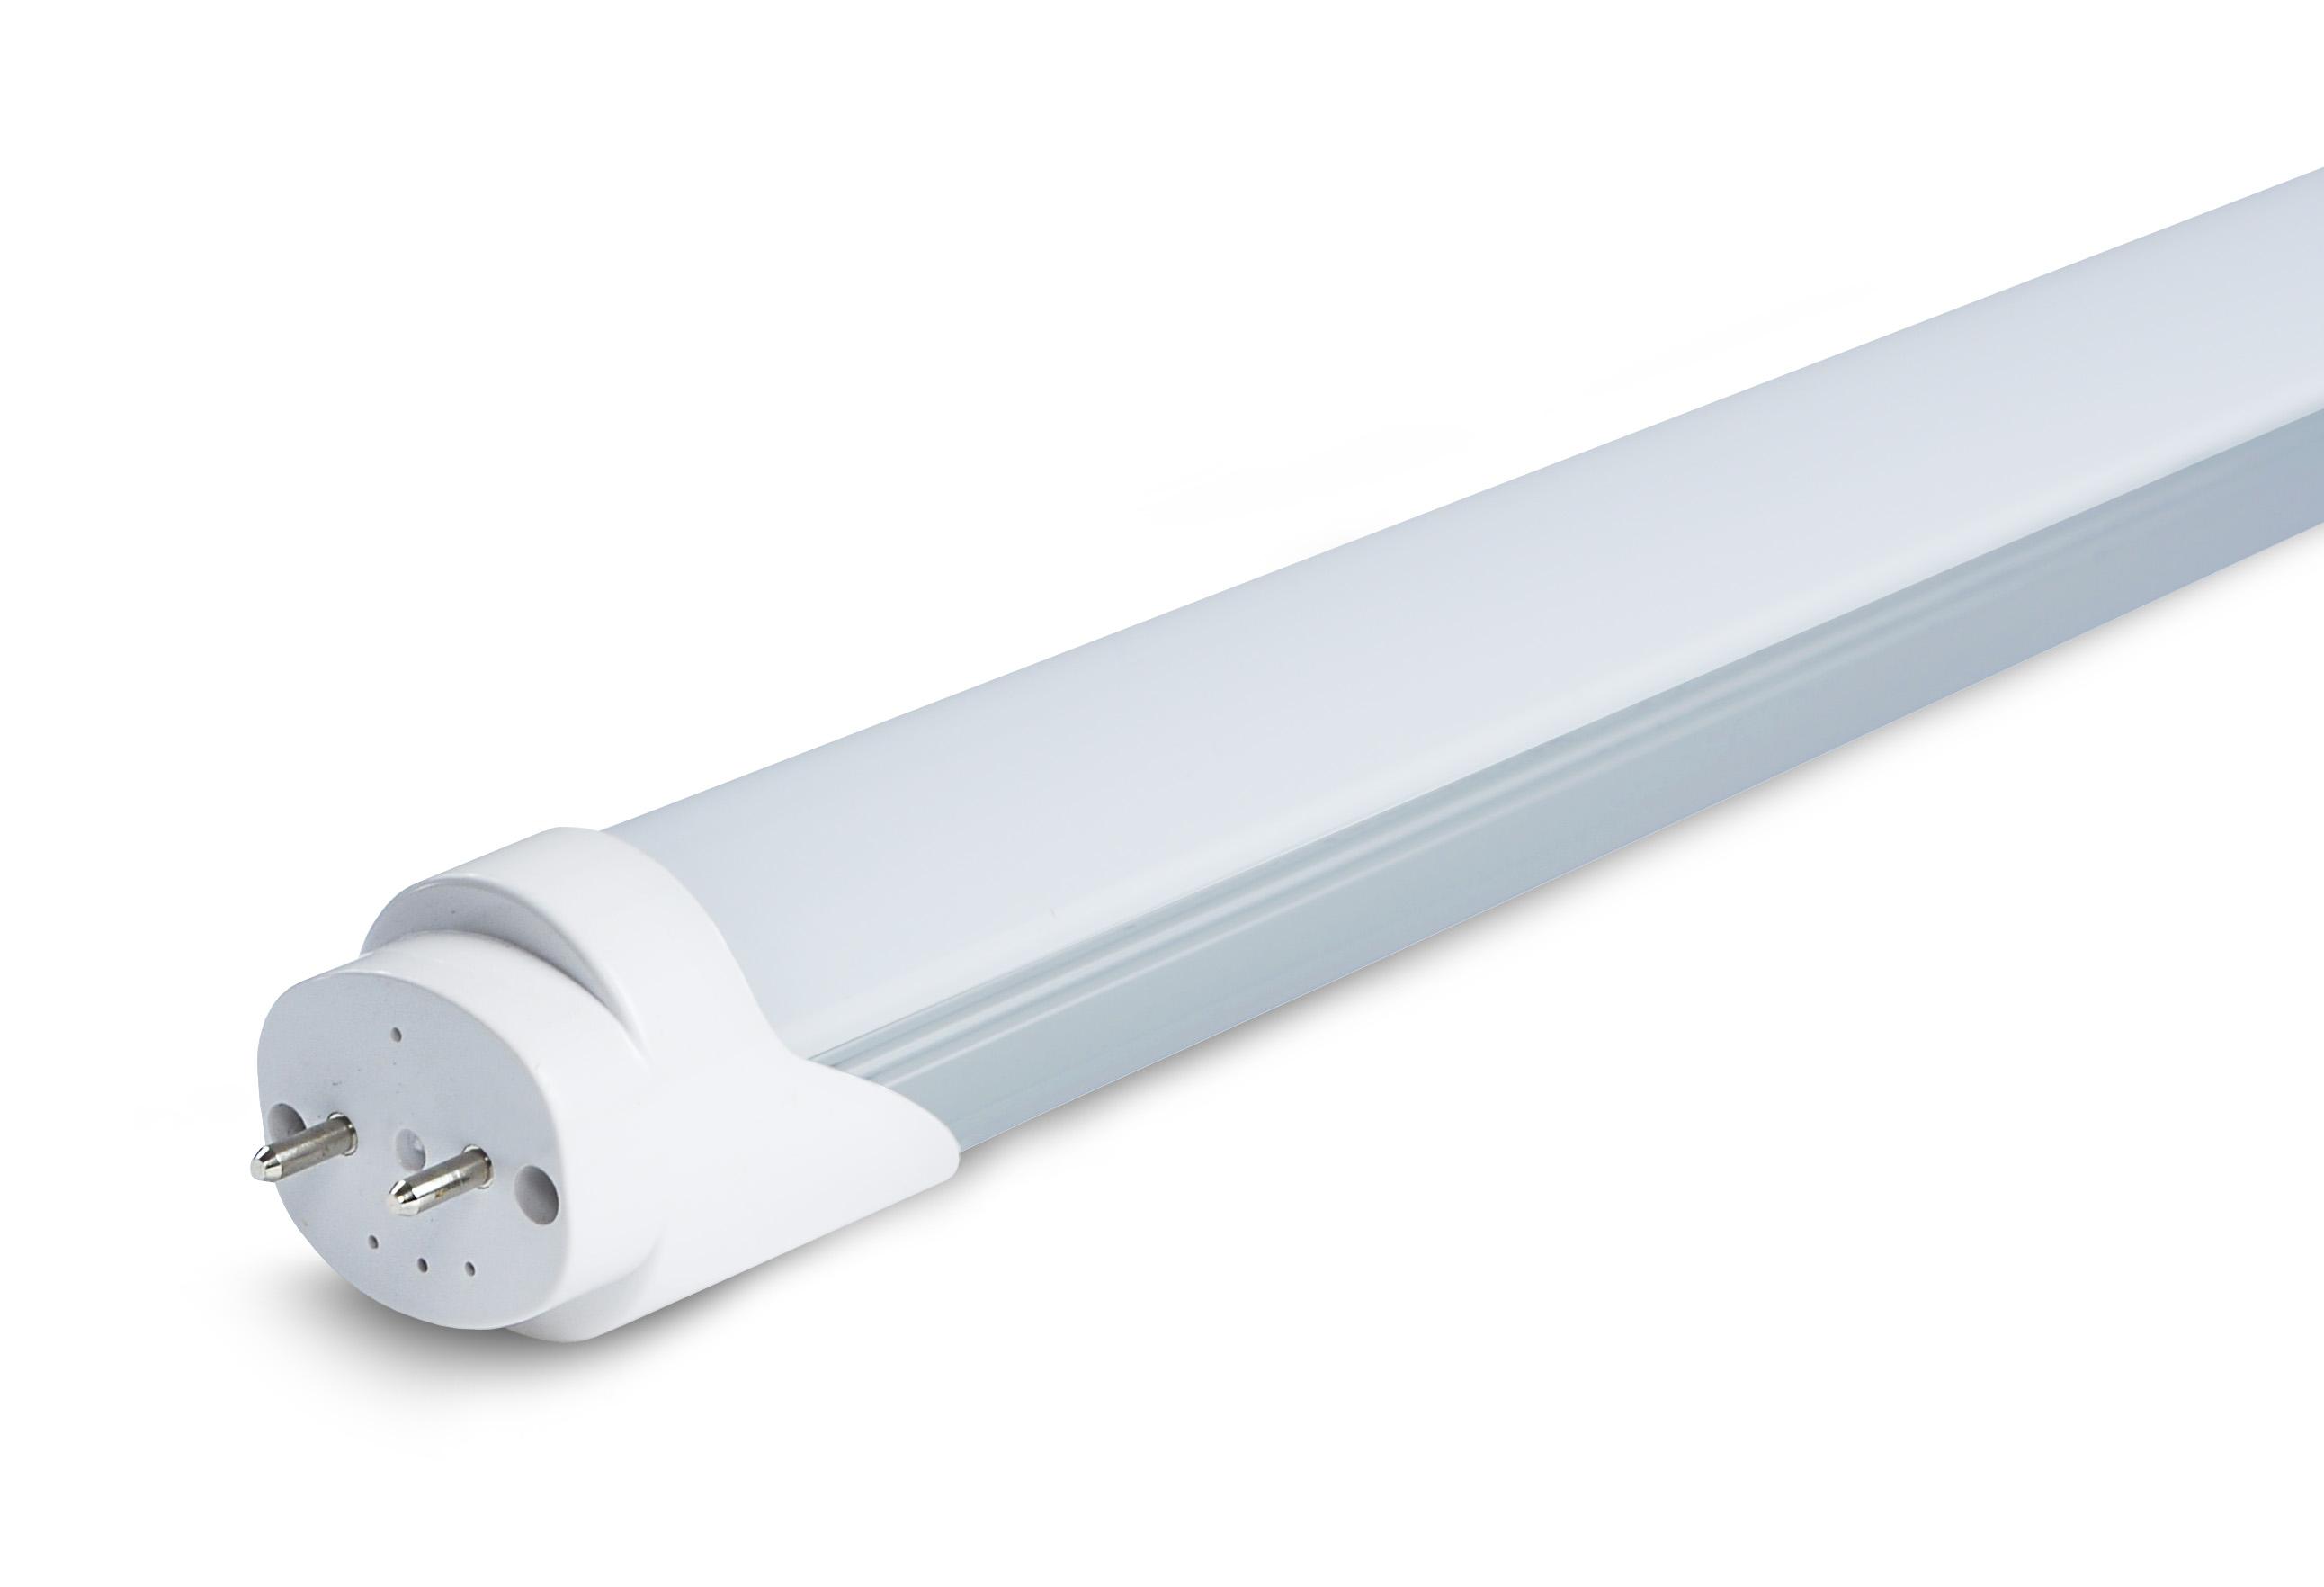 LED Solution LED žiarivka 150cm 24W 140lm/W Premium ZAR150CM24W